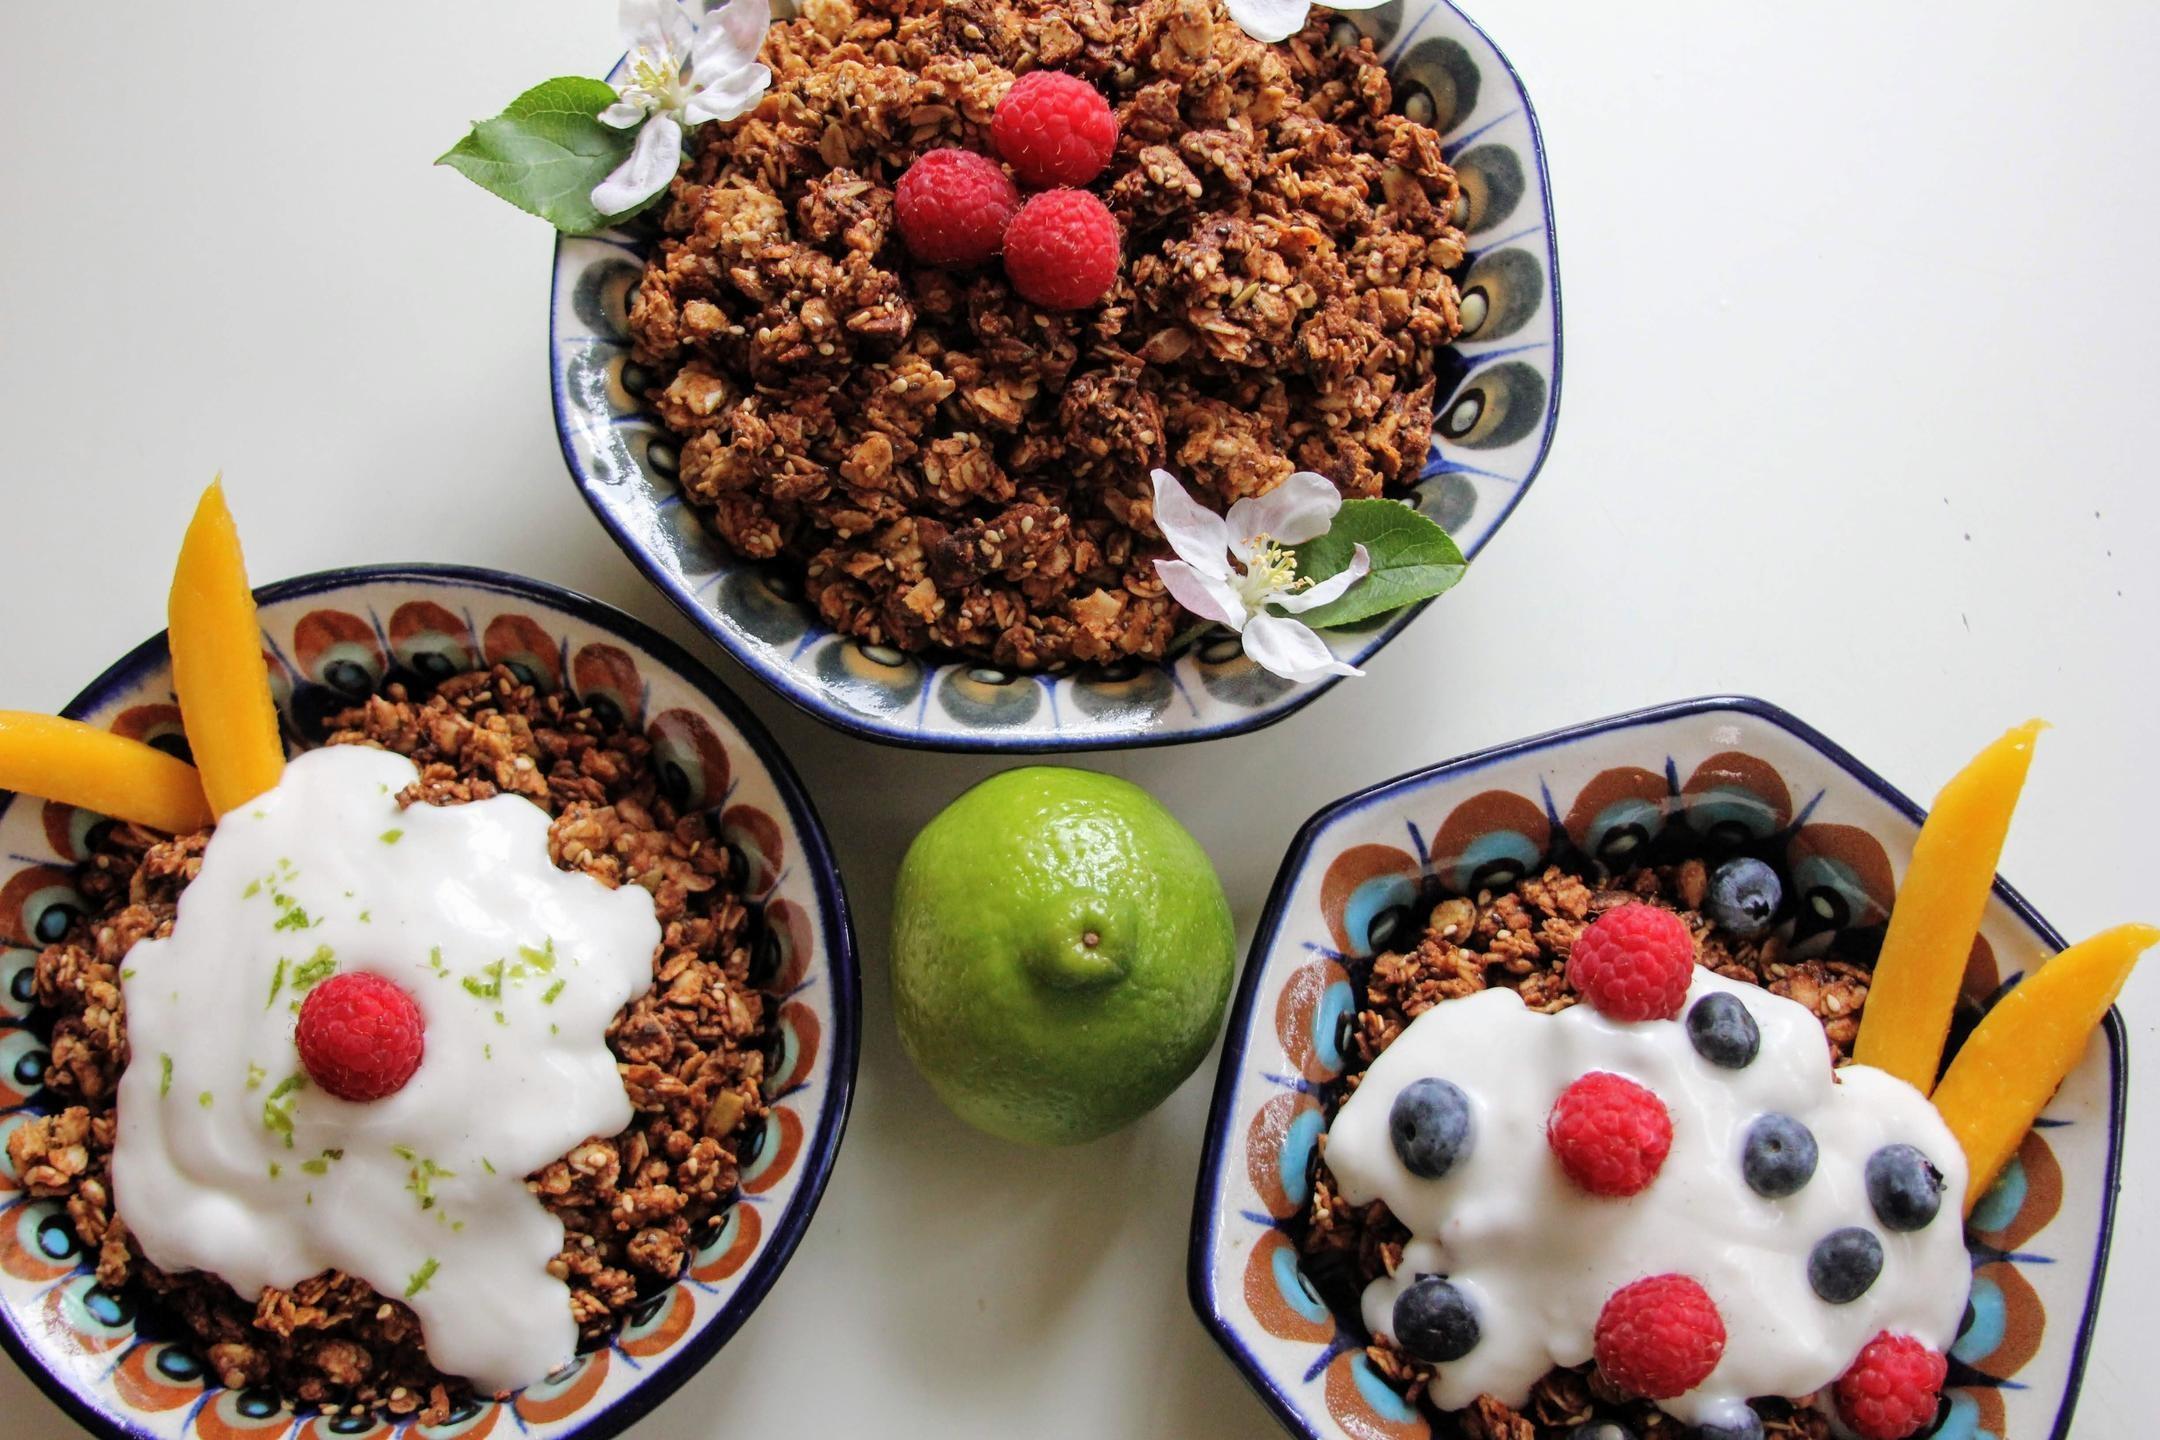 Vegan High-Protein Nut-Free Granola in 3 bowls with vegan yogurt and fruit toppings